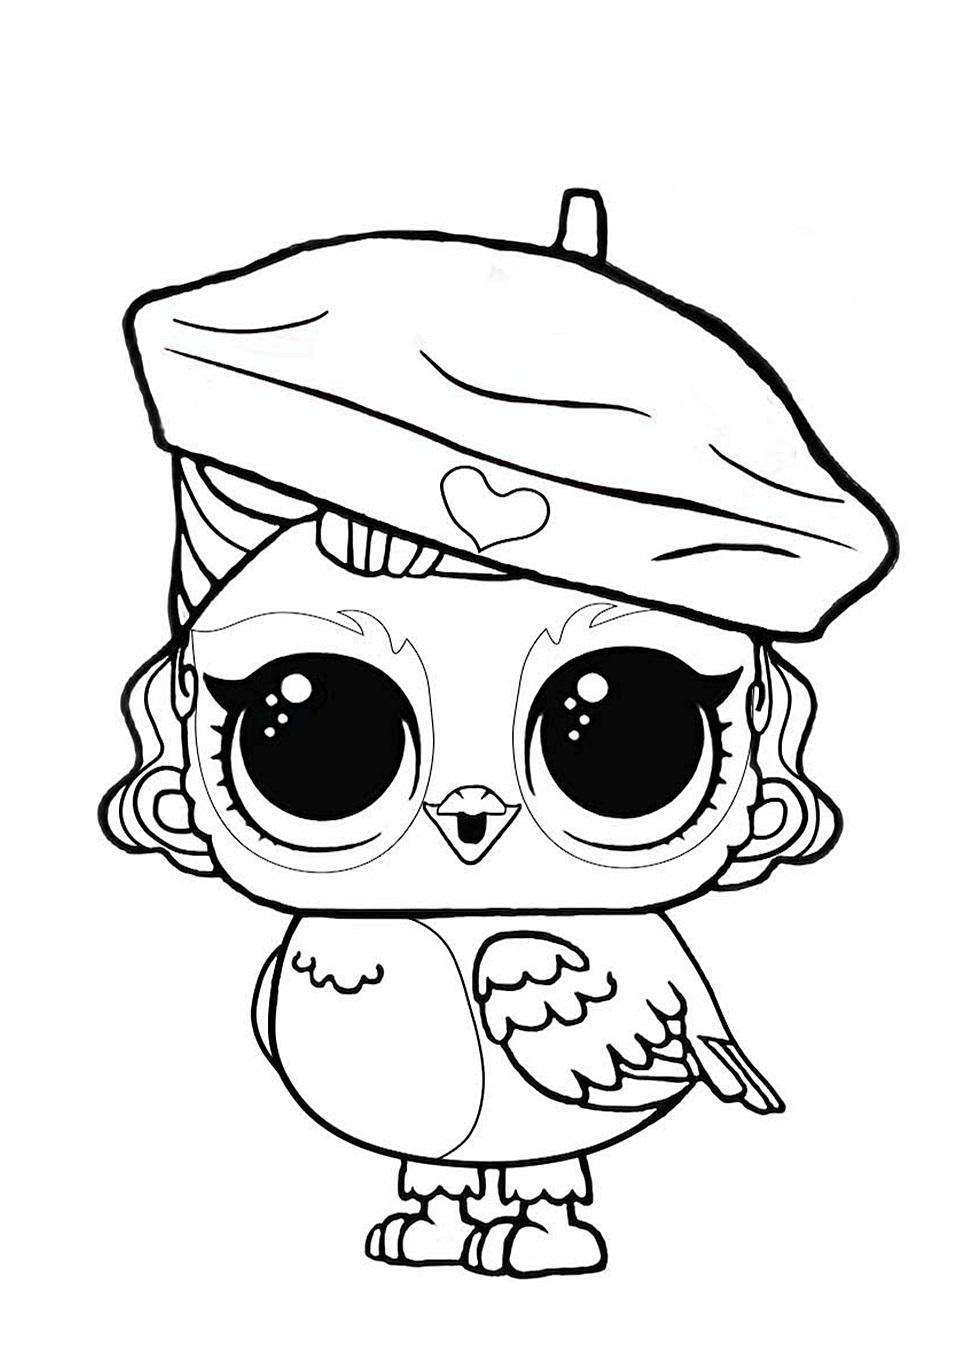 Кукла ЛОЛ сова - Куклы LOL - Раскраски антистресс